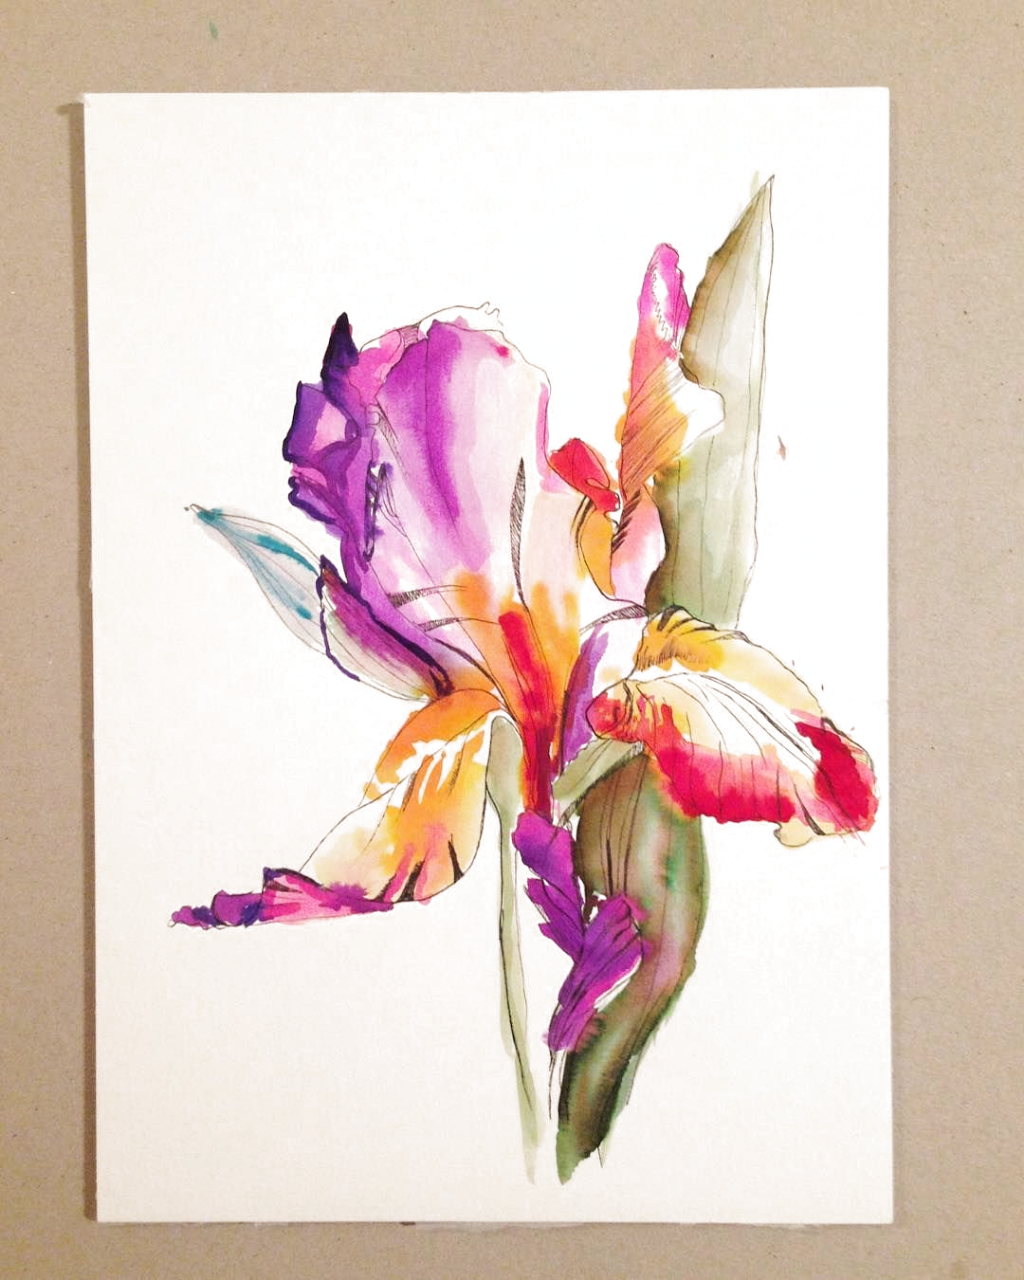 If I could, Id be painting 24/7🌸🌺🌸 #illustration #watercolor #flowers #flowerstagram #mood #print #printdesign #sketch #sketchbook #textiledesign #berlin #pattern #patterndesign #surfacedesign #floral #botanical #mood #inspiration #iris #nature #instart #art #artwork #printandpattern